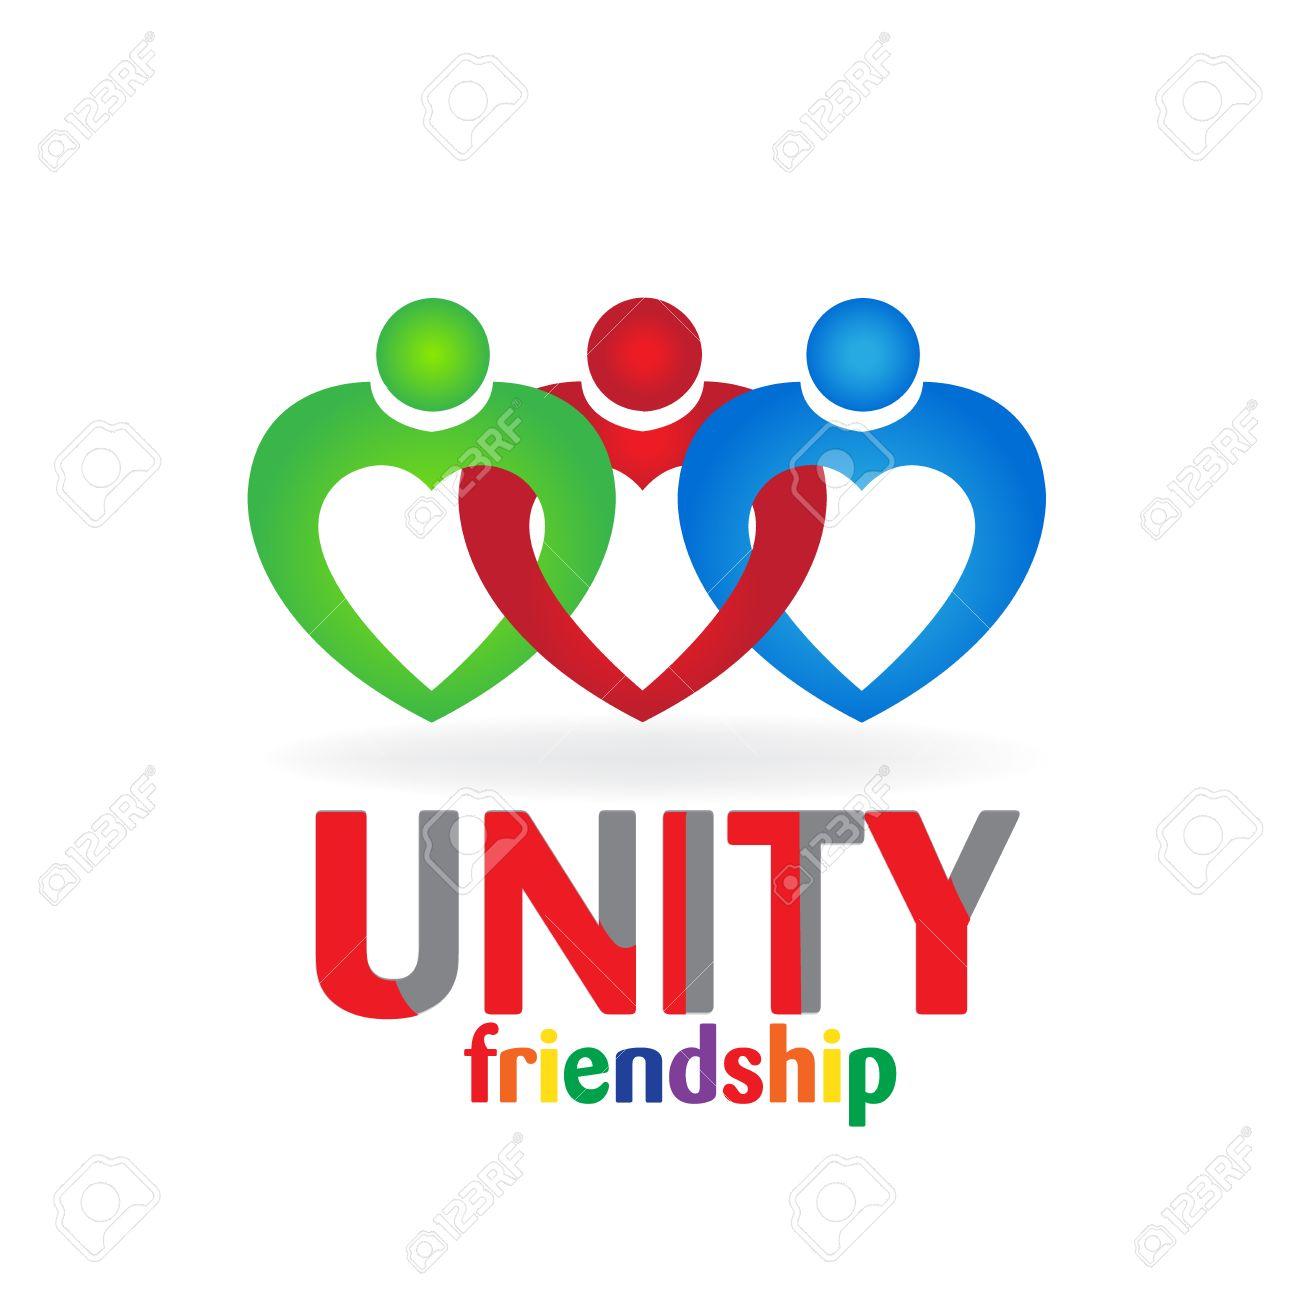 Coeur Amour Travail Dquipe Unit Amiti Carte De Visite Icne Logo